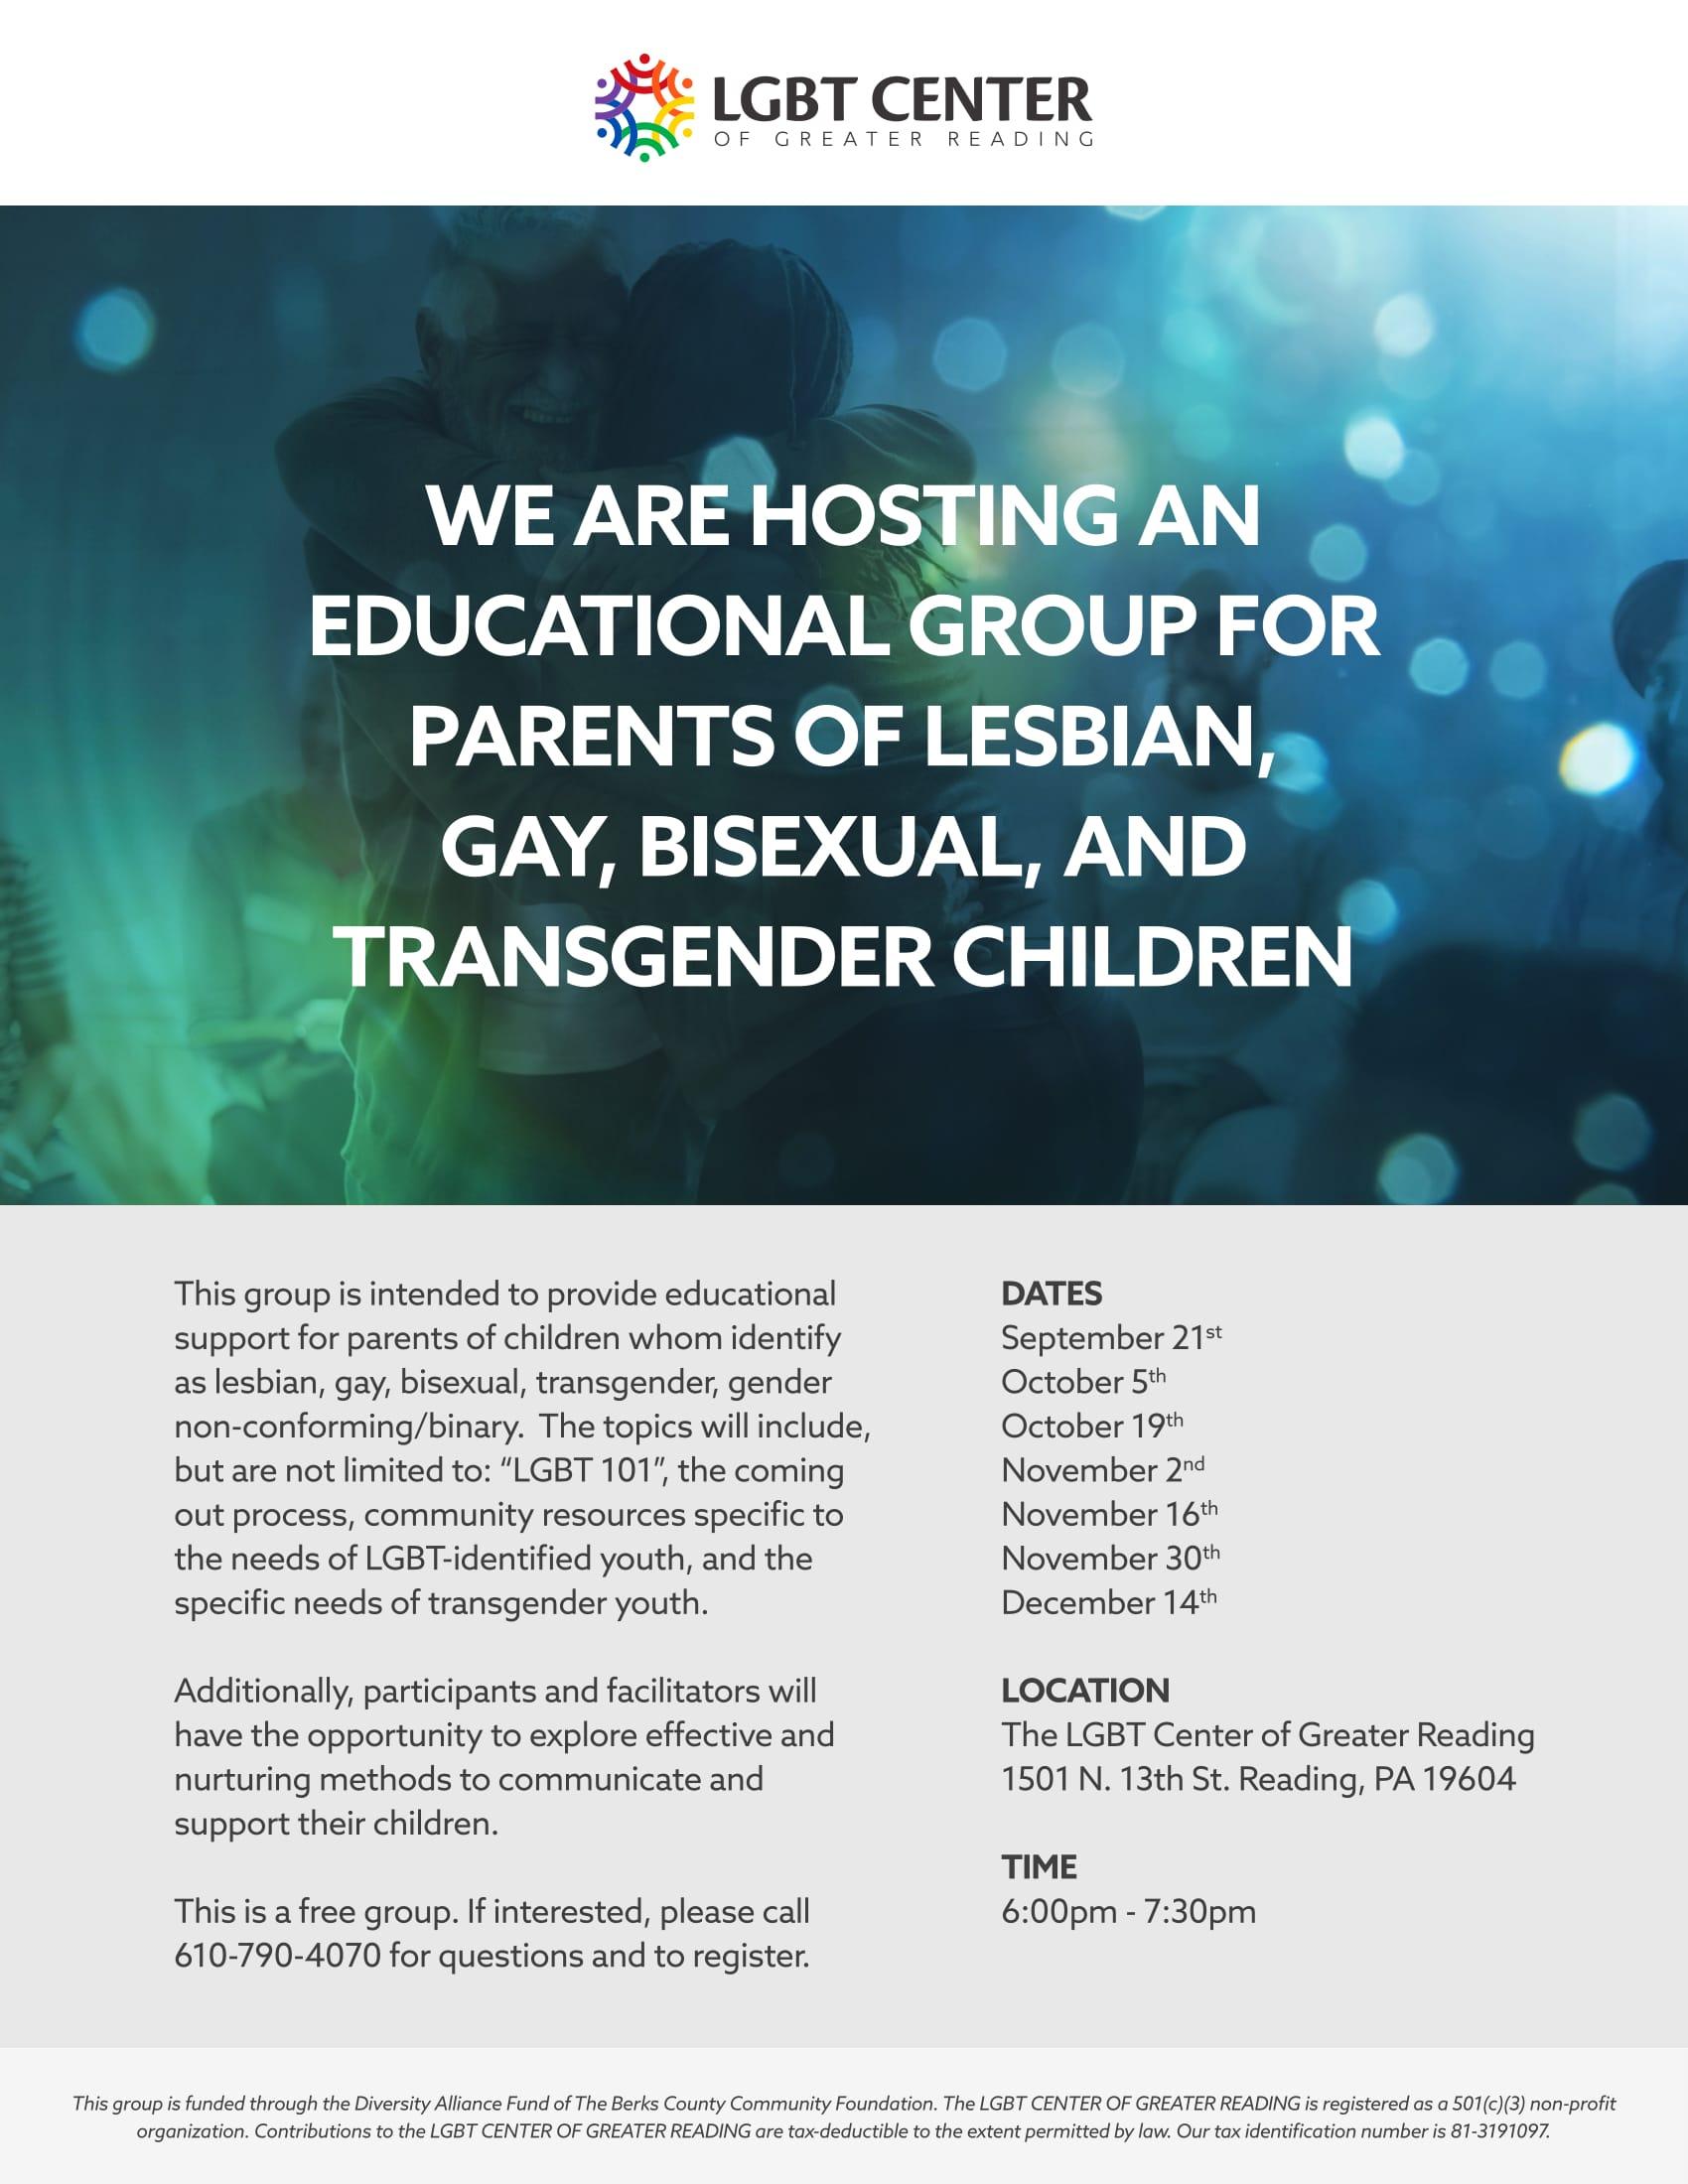 LGBT Parents Group Flyer (1)-1.jpg